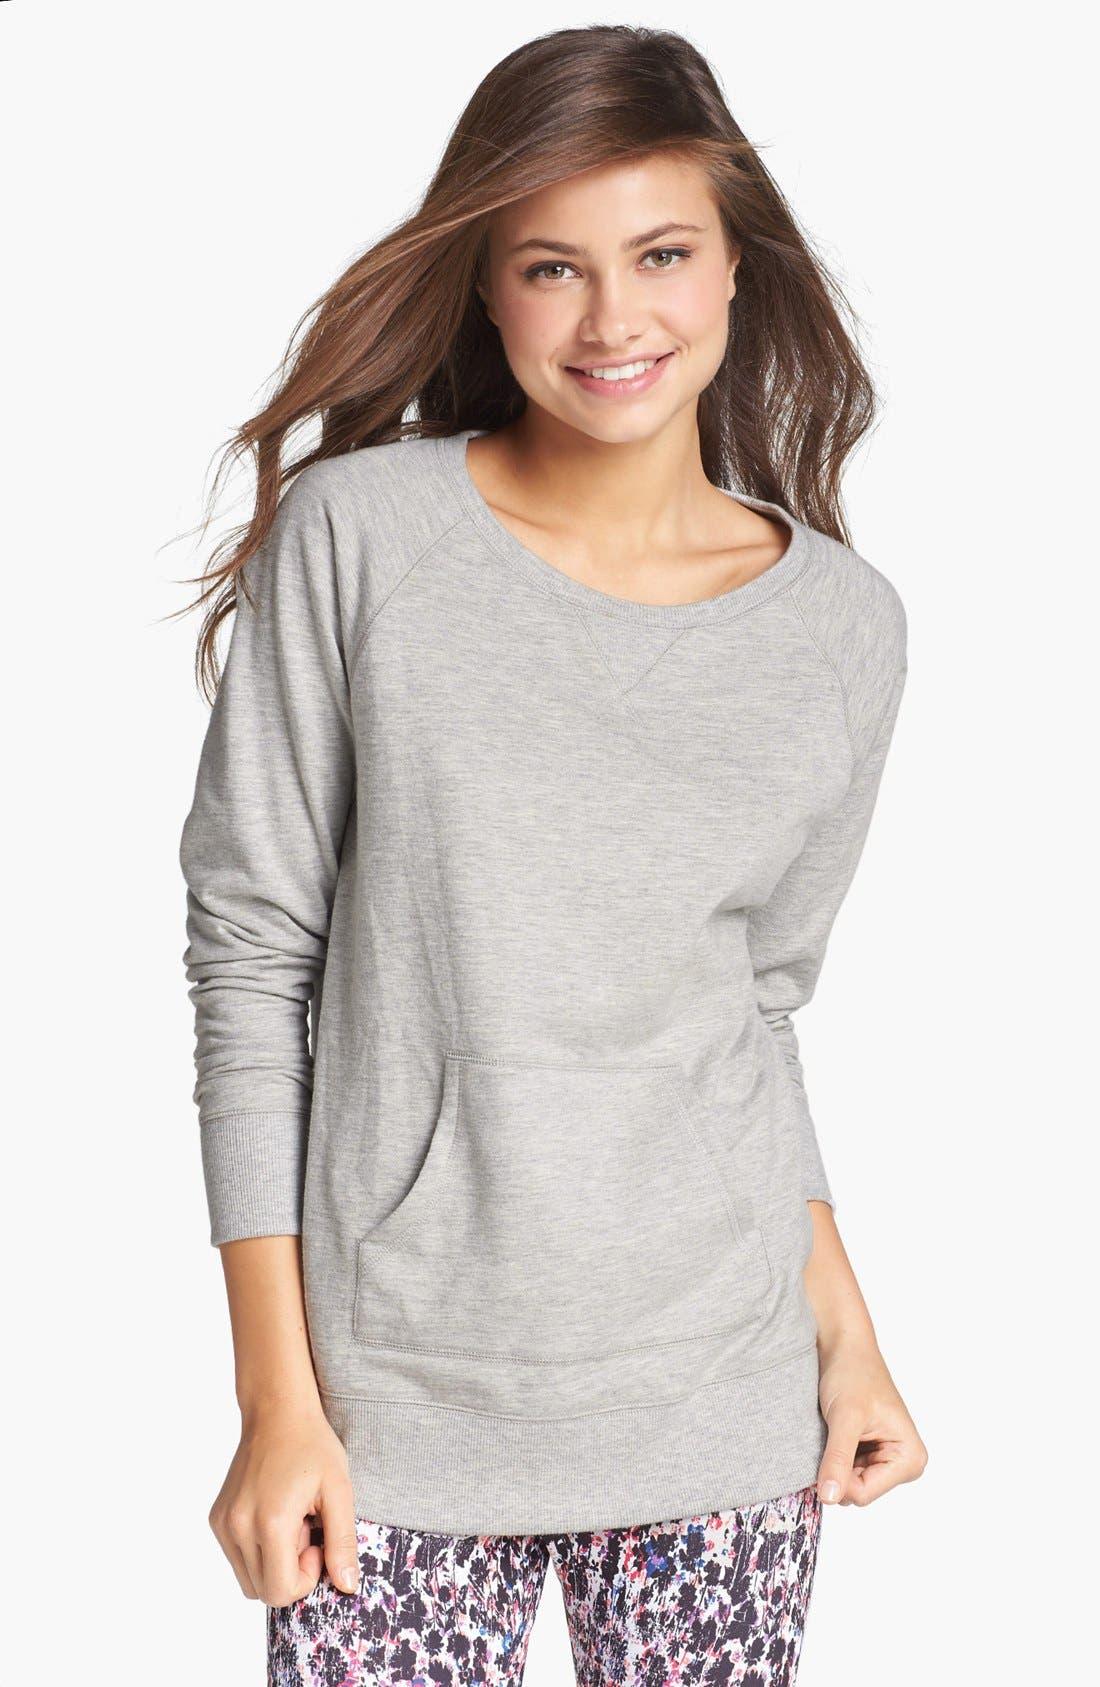 Main Image - BP. Undercover 'Snuggle Up' Sweatshirt (Juniors)